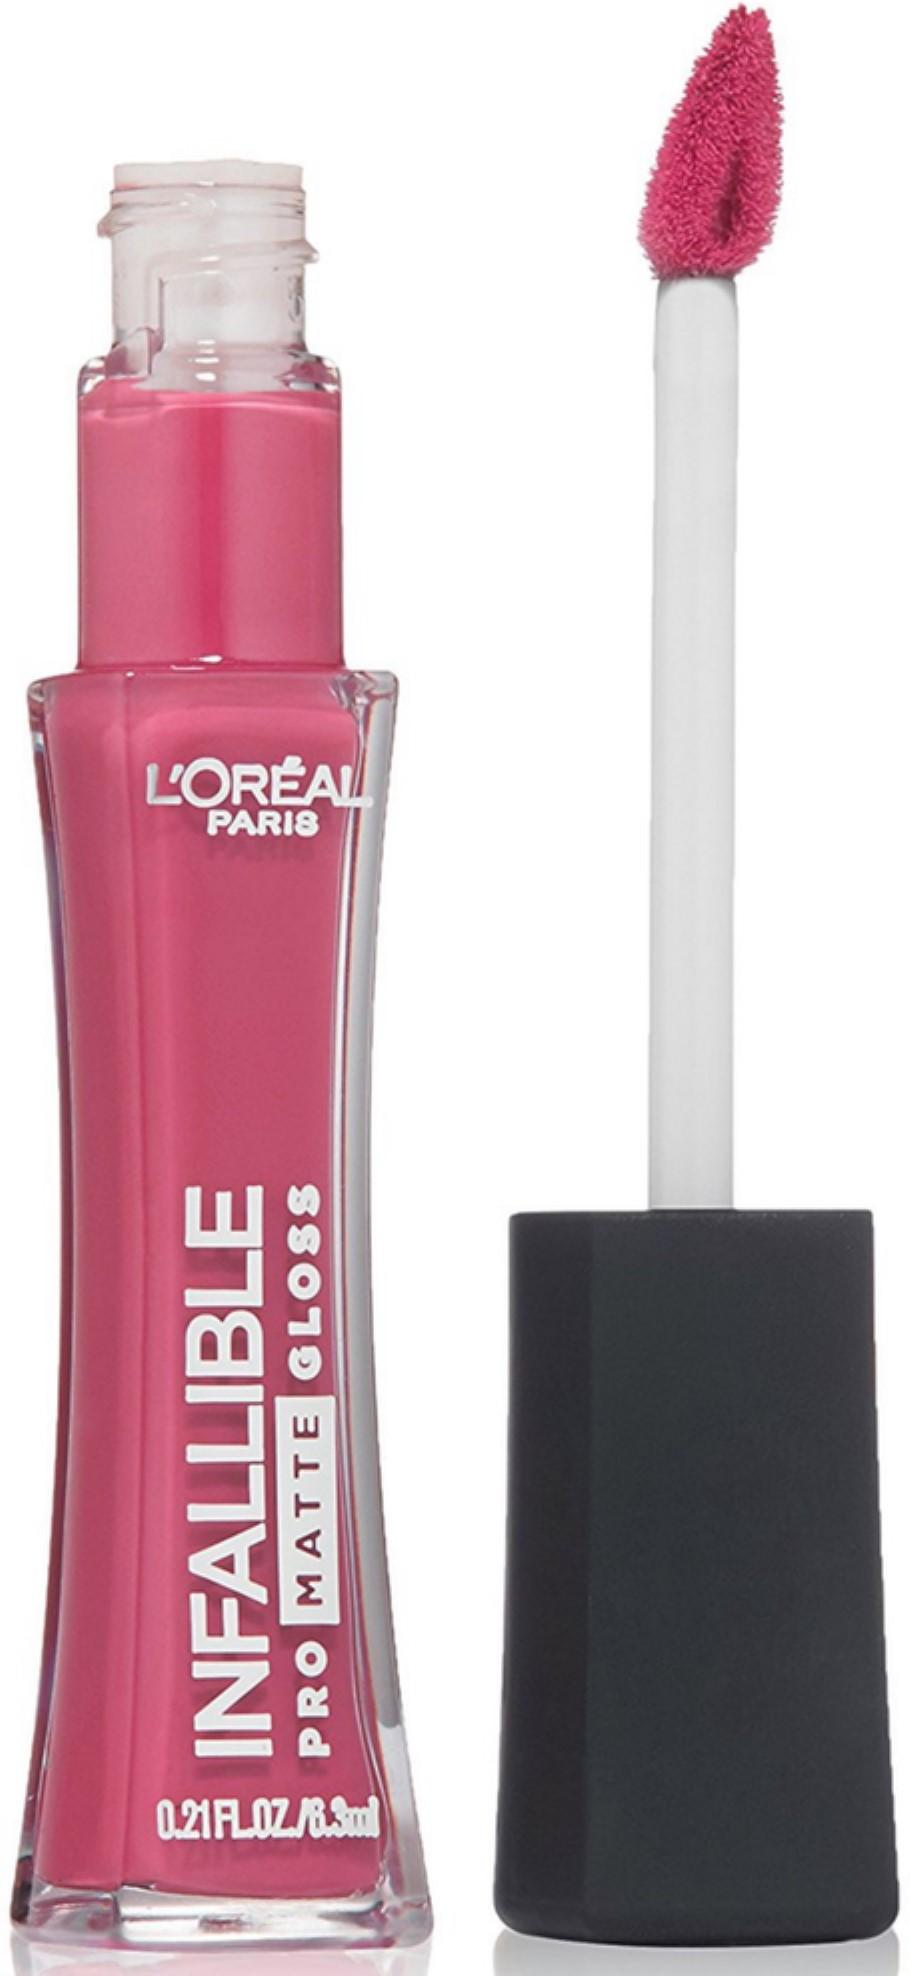 L'Oreal Paris Infallible Lip Pro Matte Gloss, Fuchsia Amnesia